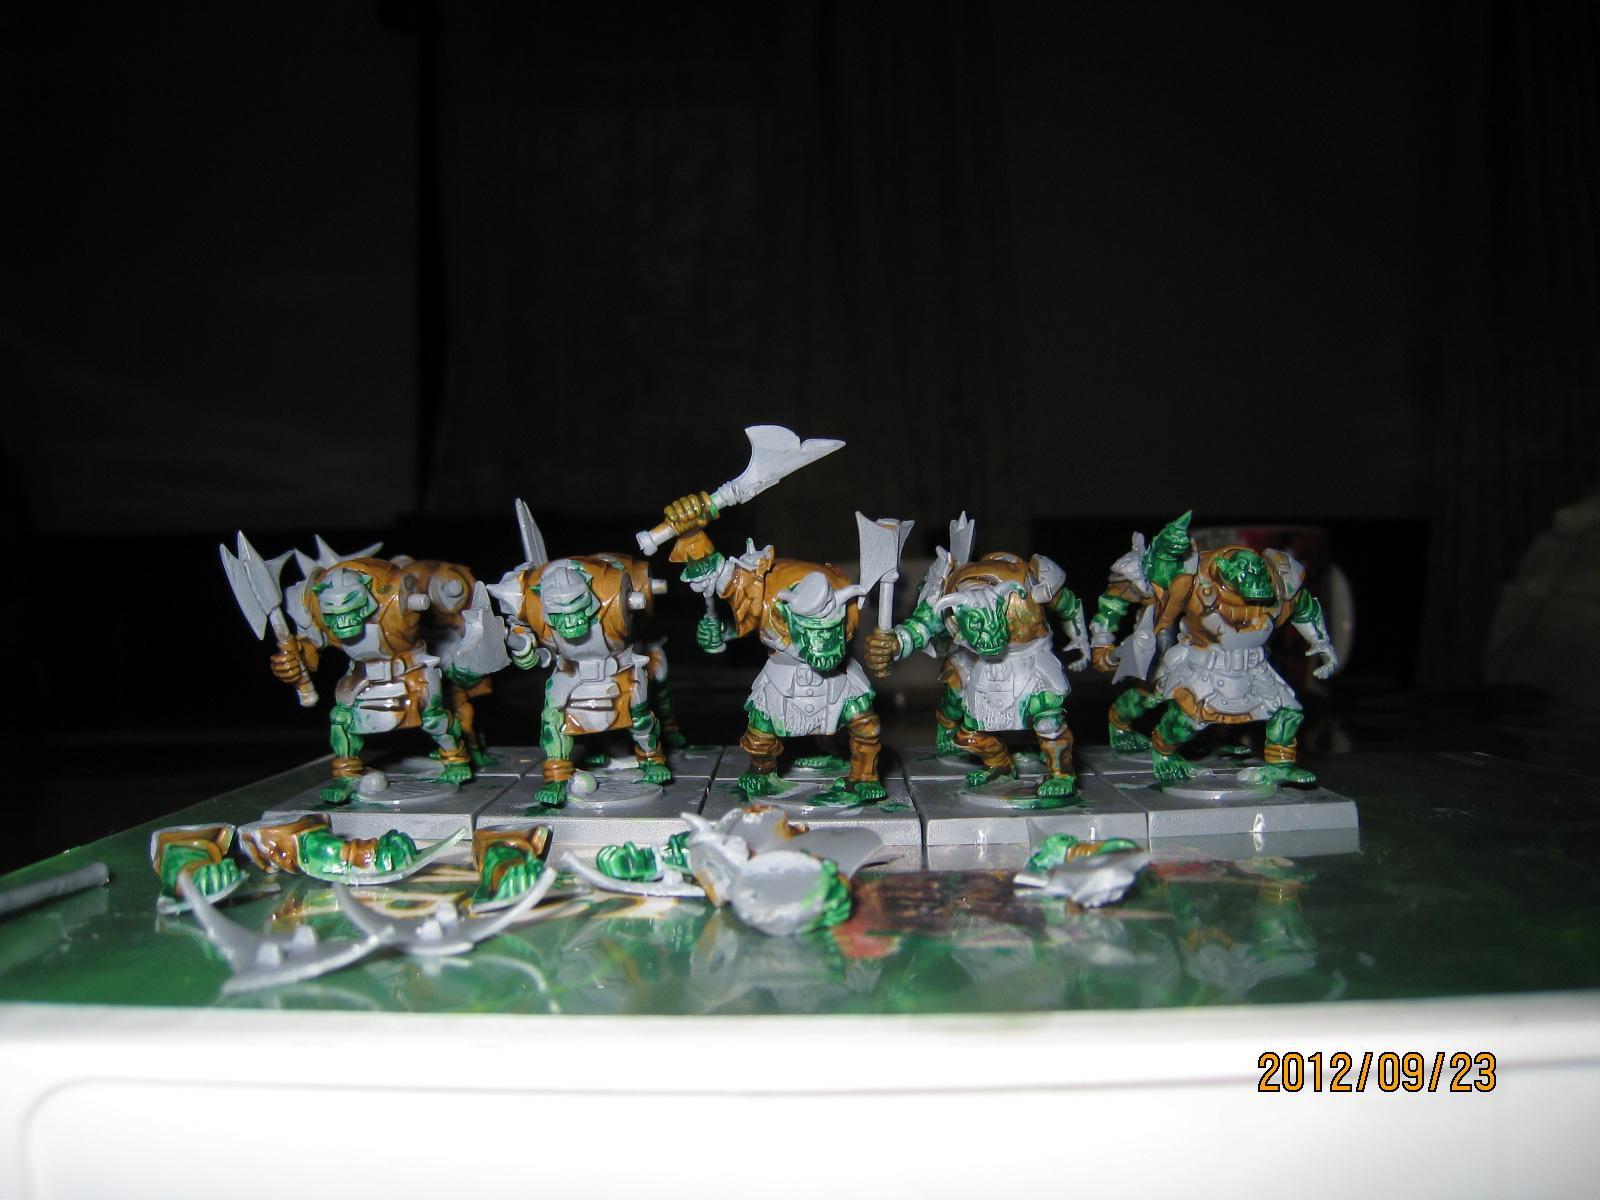 Axe, Mantic, Orcs